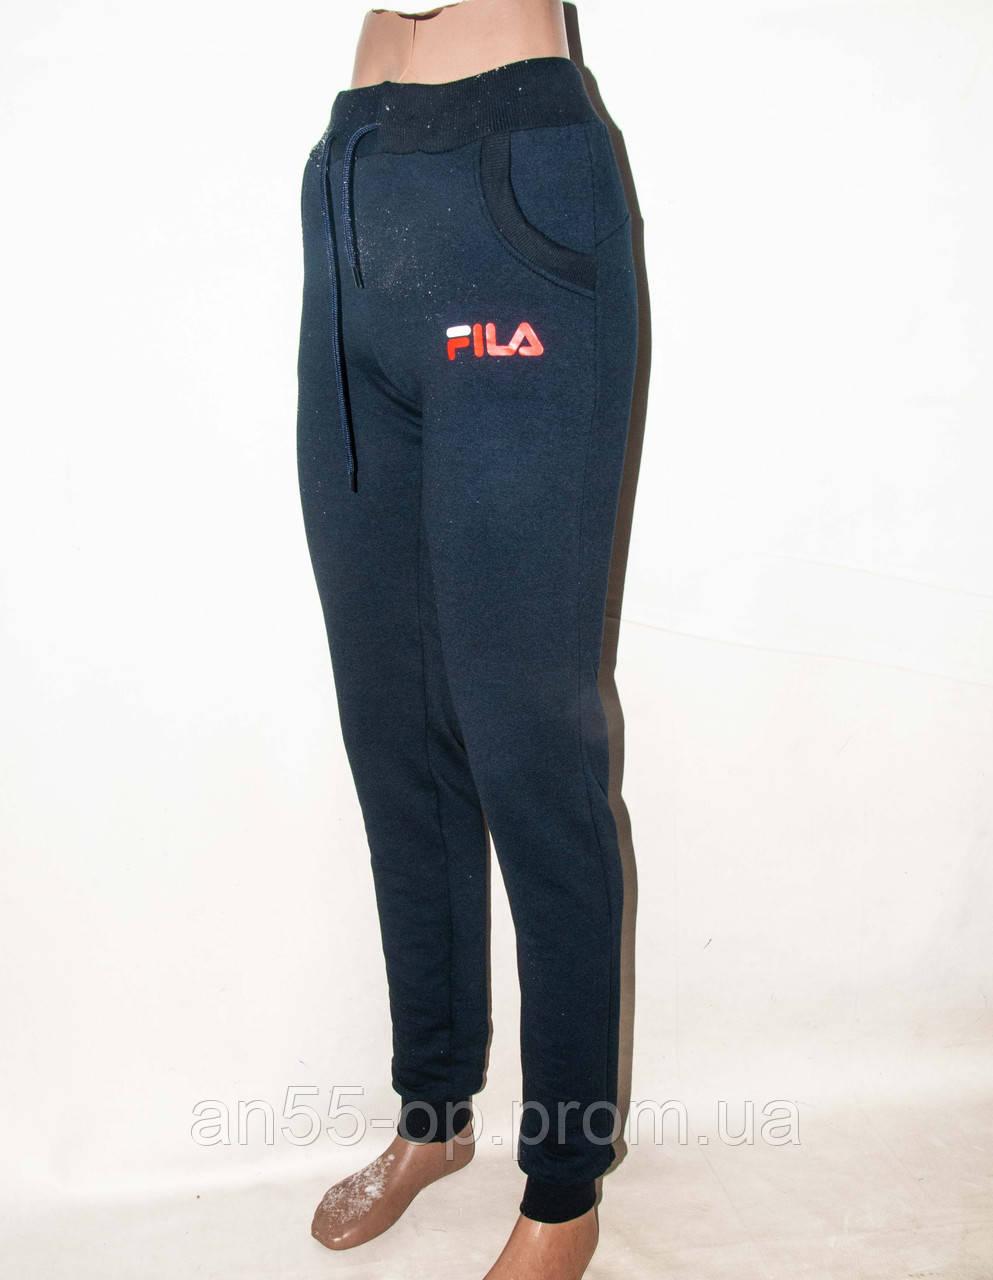 9db7e318827e2c Спортивные штаны женские FILA трикотаж норма (Р.44-50).Оптовая продажа со  склада на 7км(Одесса) ...